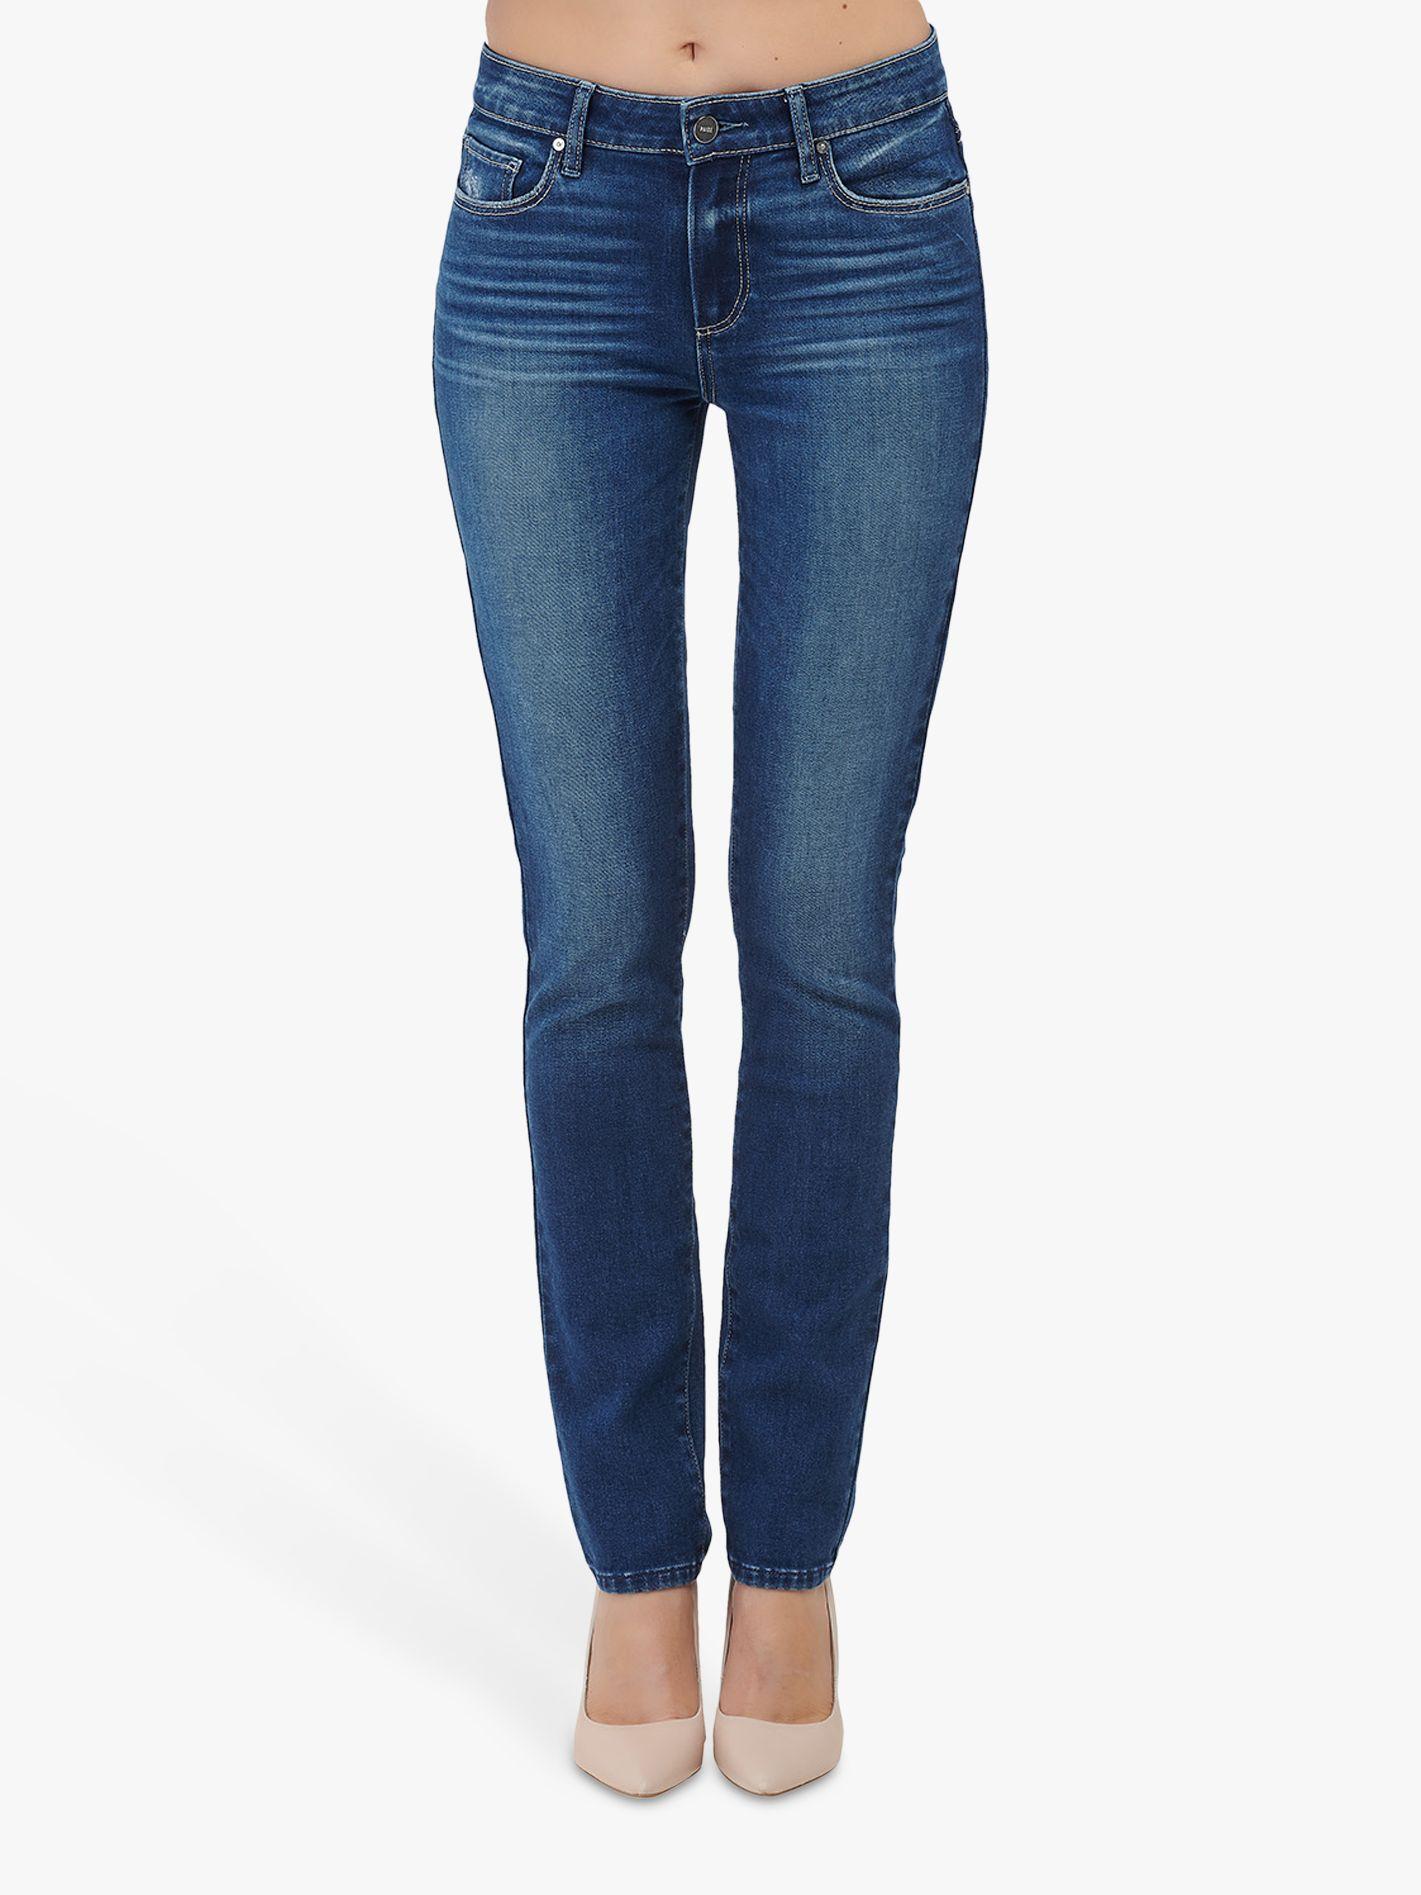 Paige Paige Skyline Skinny Jeans, Lookout